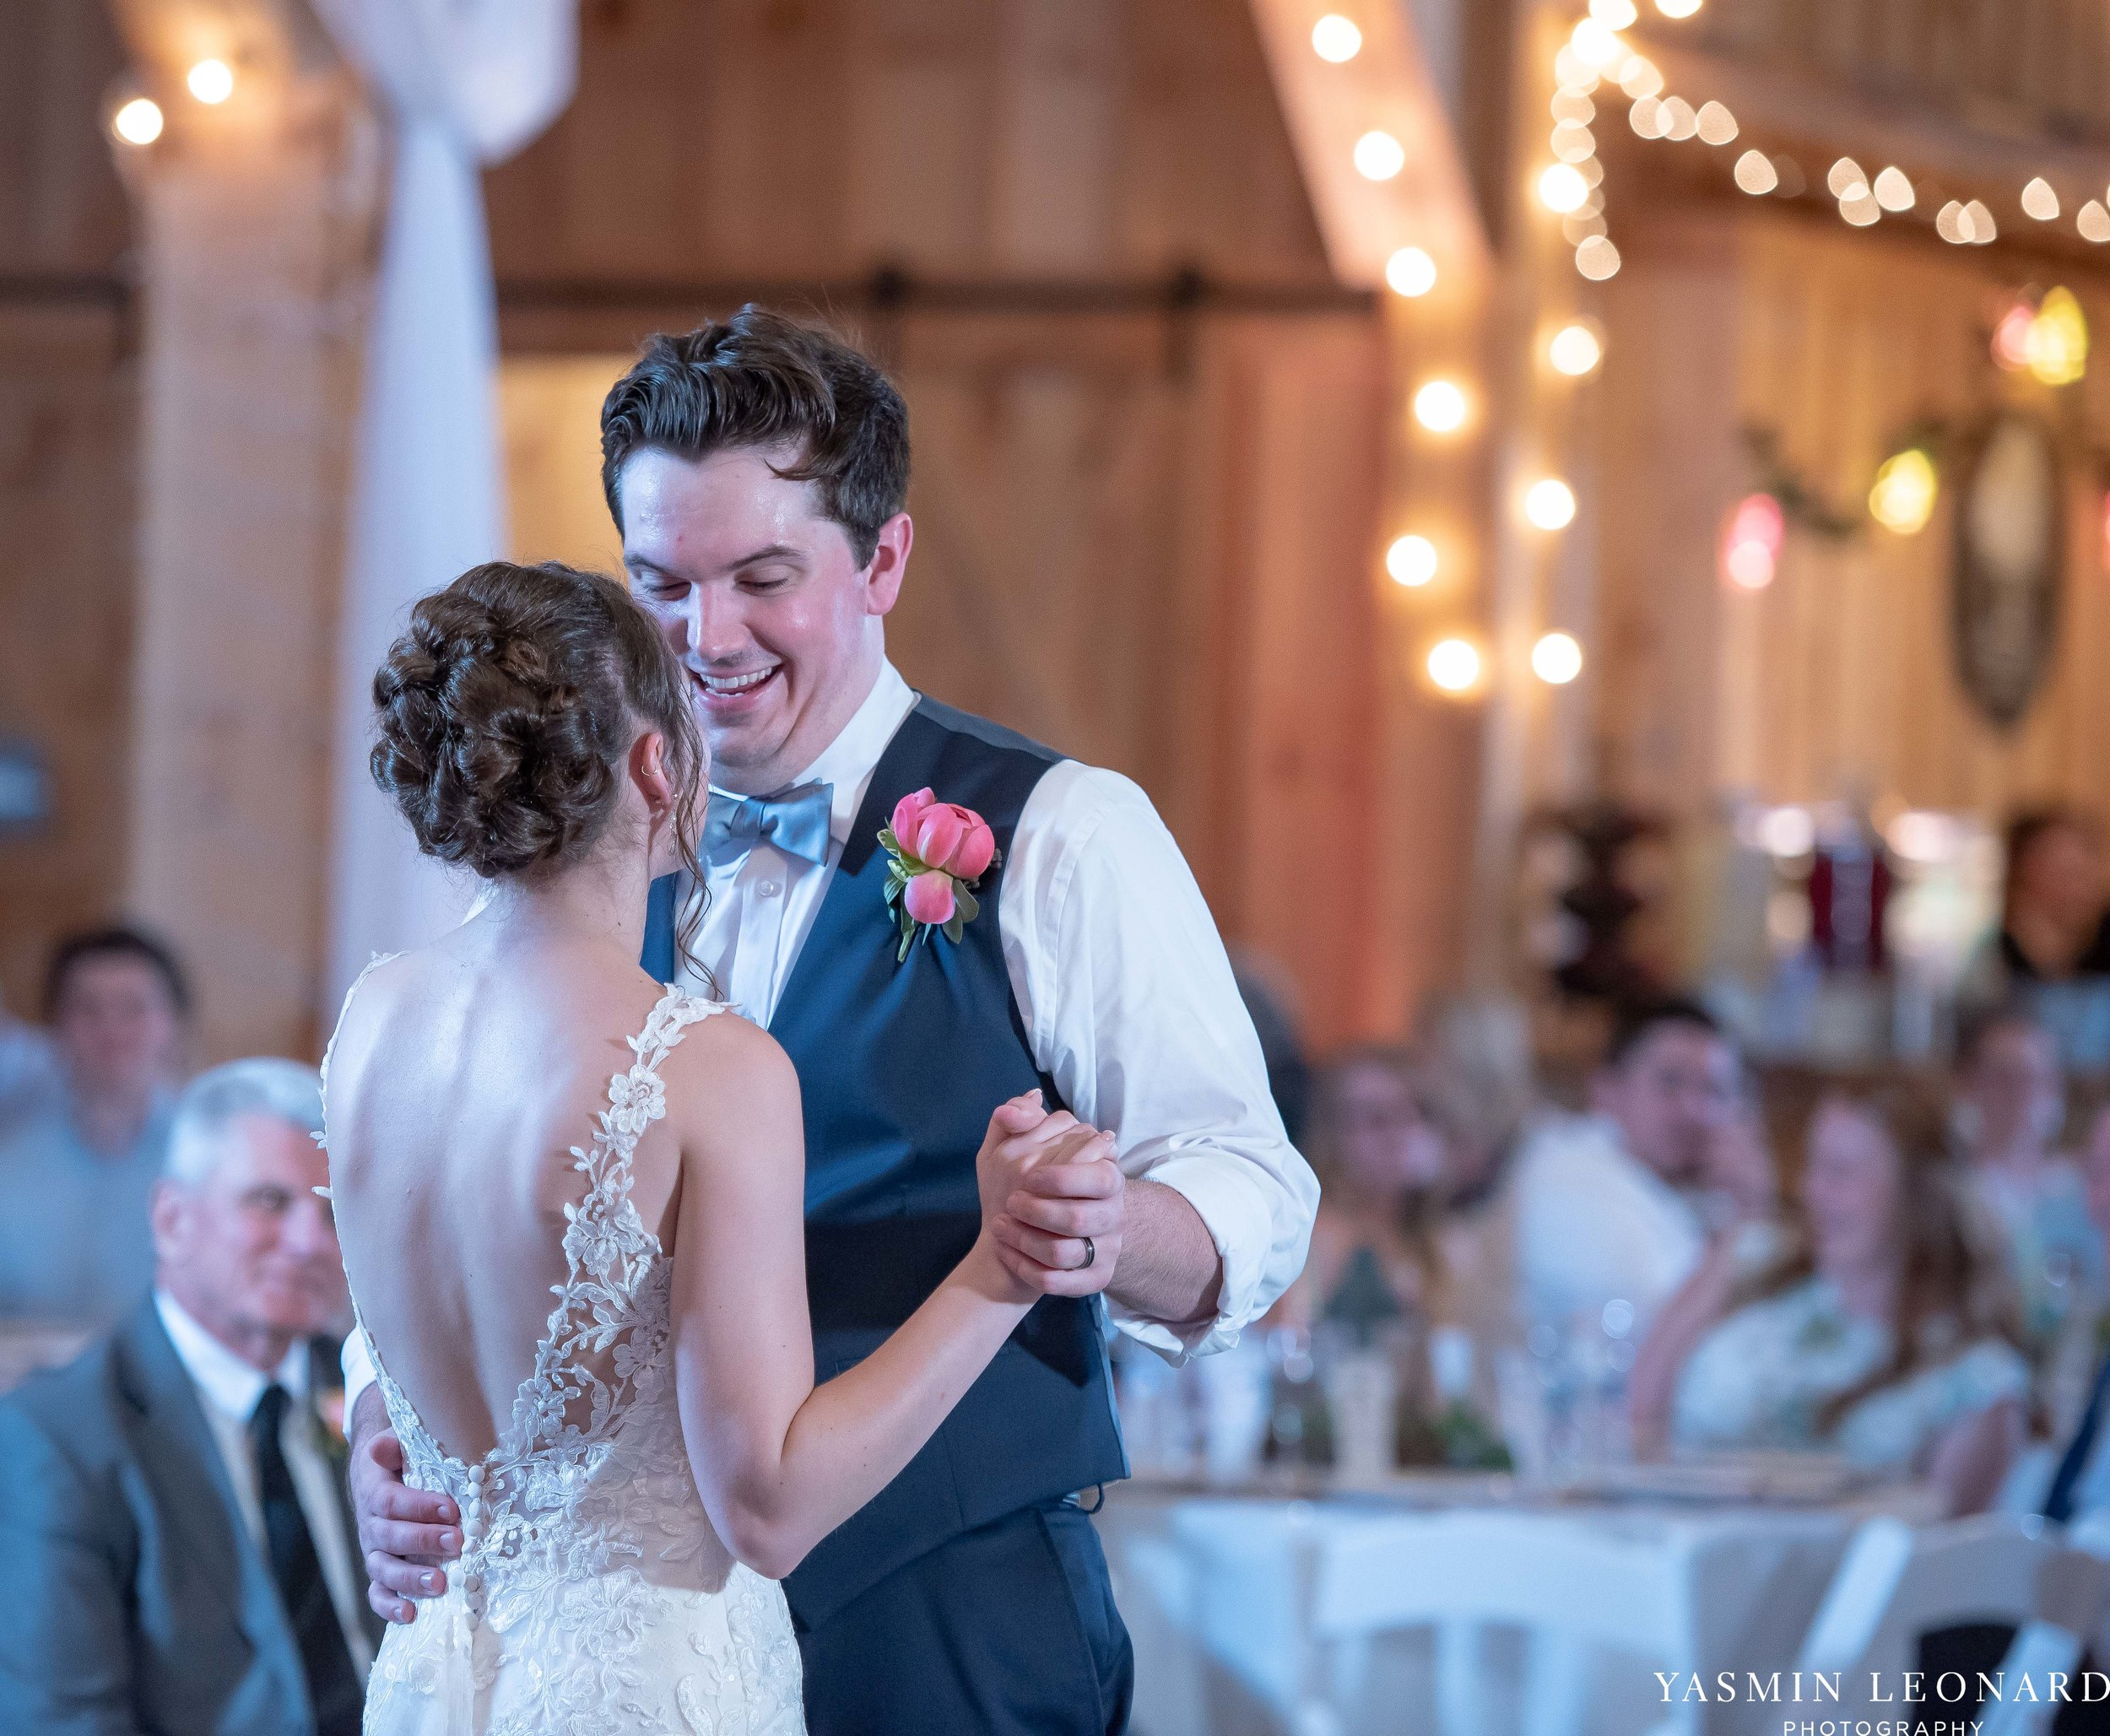 Old Homeplace Vineyard - NC Weddings - Outdoor Summer Weddings - Peony Boutique - Vineyard Wedding - NC Photographer - Yasmin Leonard Photography-50.jpg